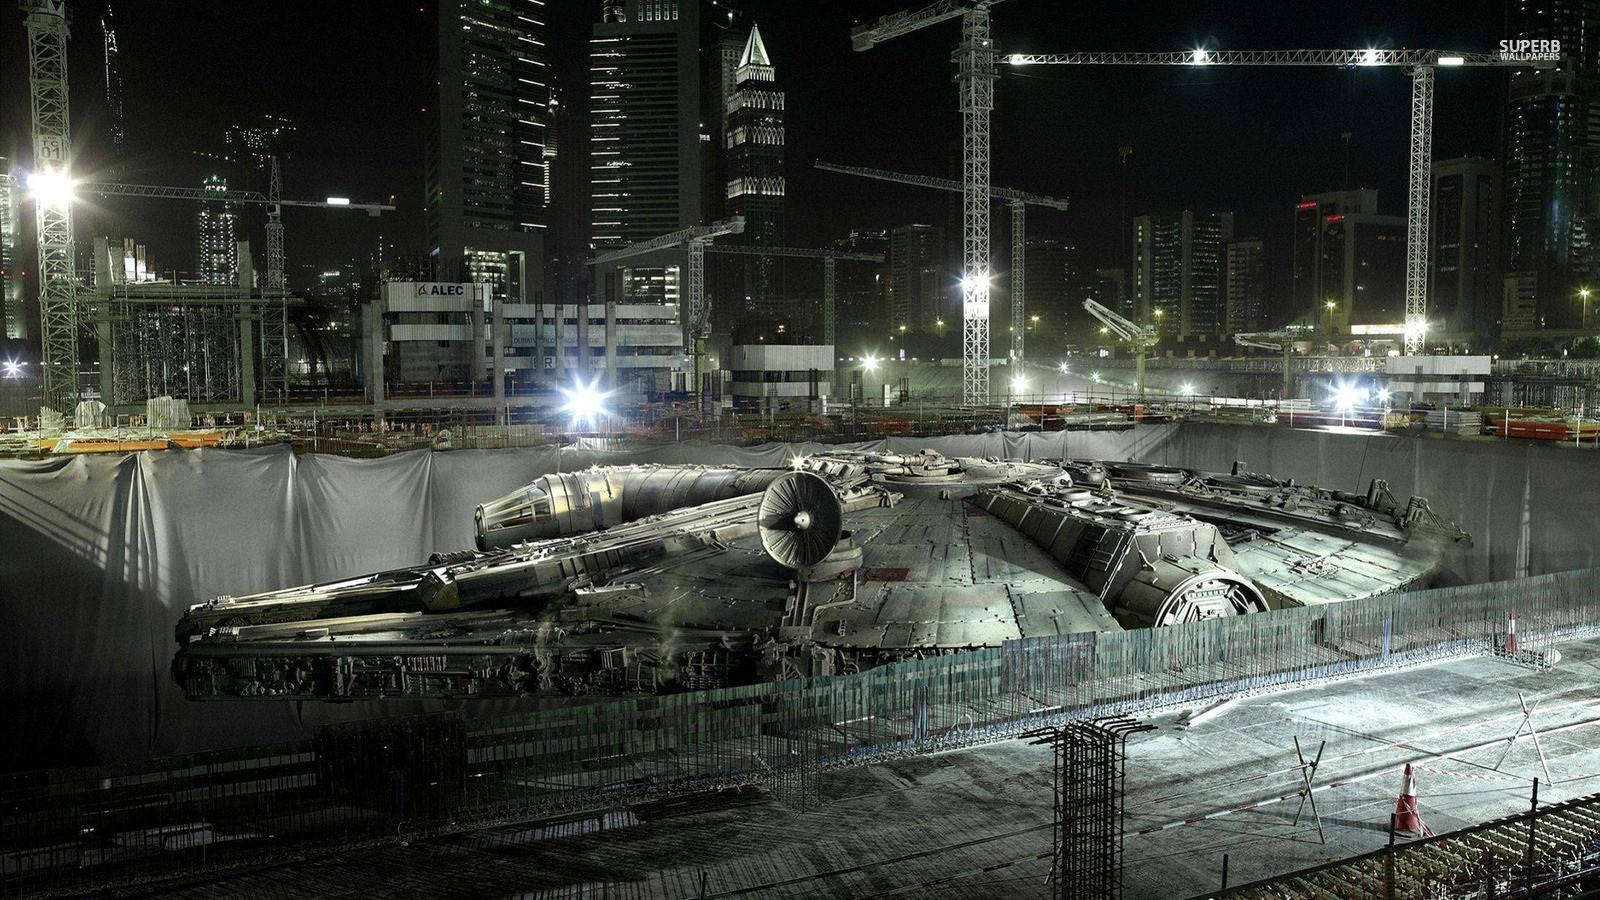 General 1600x900 Star Wars Star Wars Ships digital art cityscape cranes (machine) night construction site Millennium Falcon